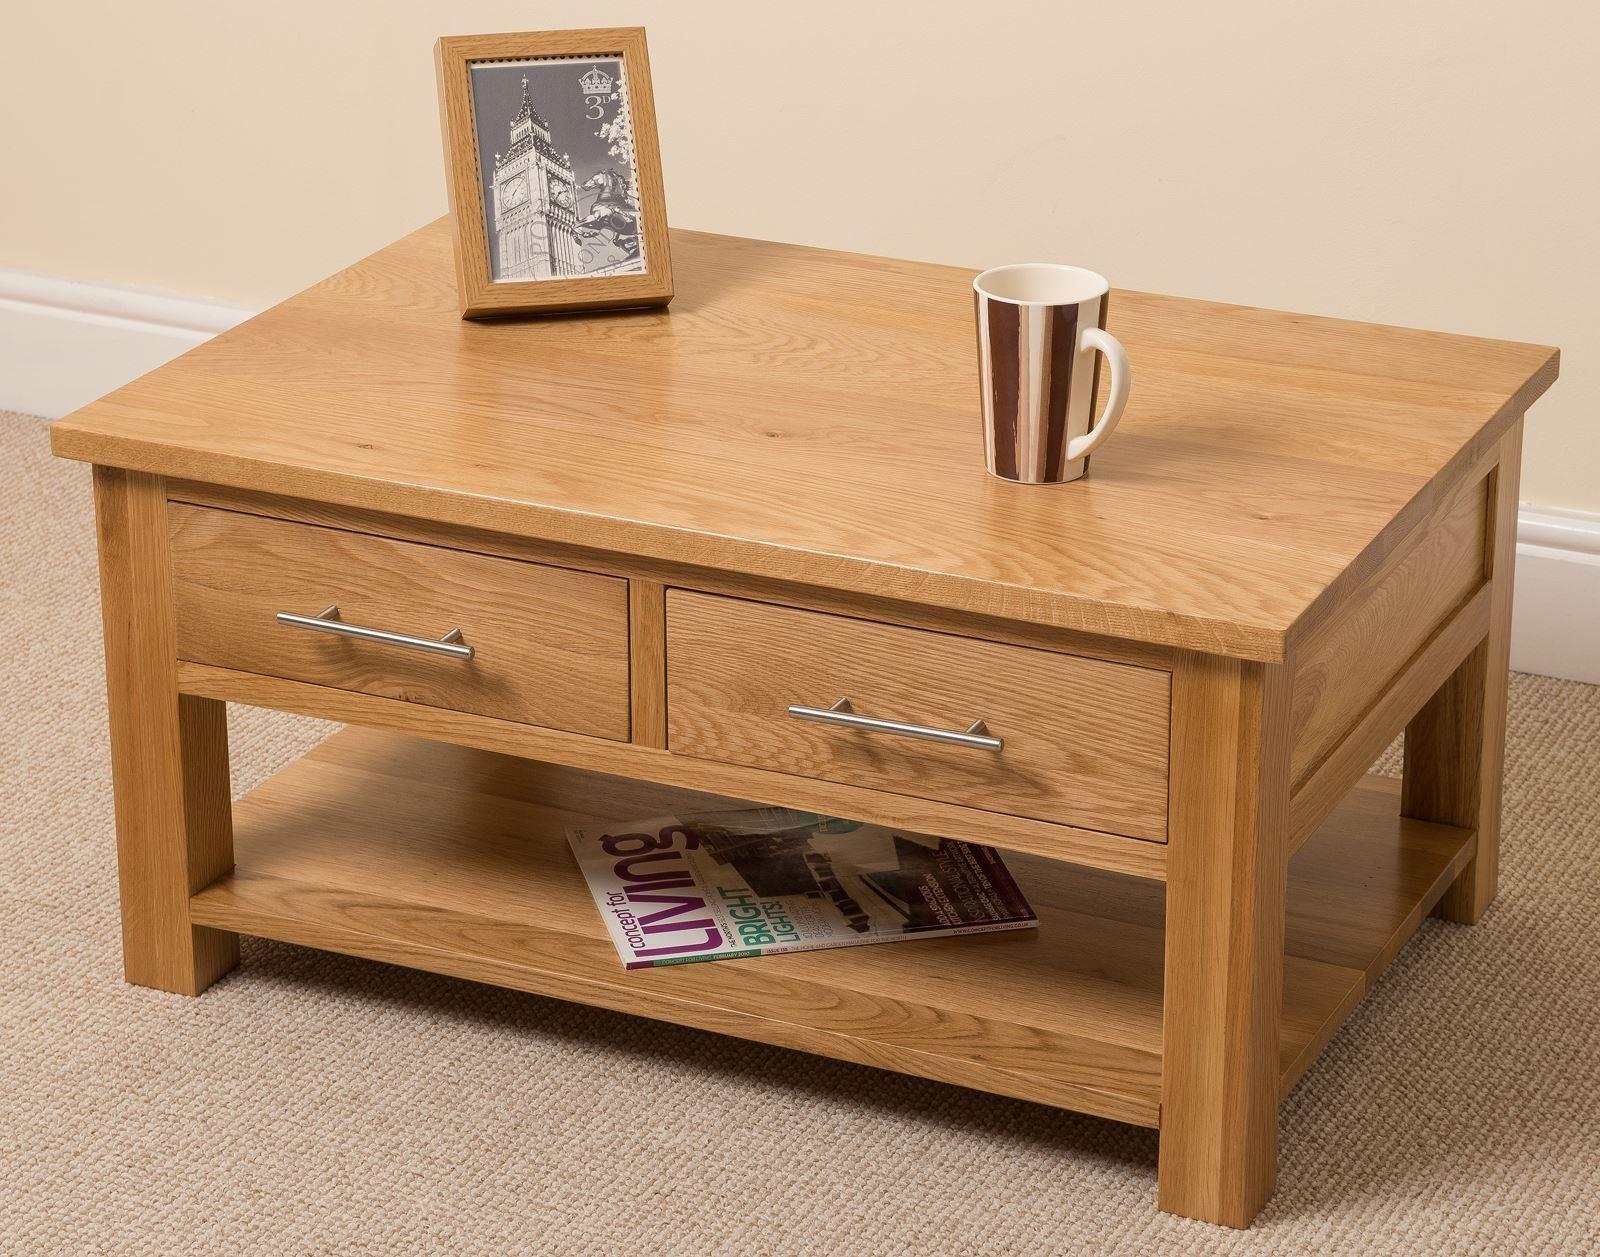 Oslo solid oak coffee table modern furniture direct for Modern furniture direct